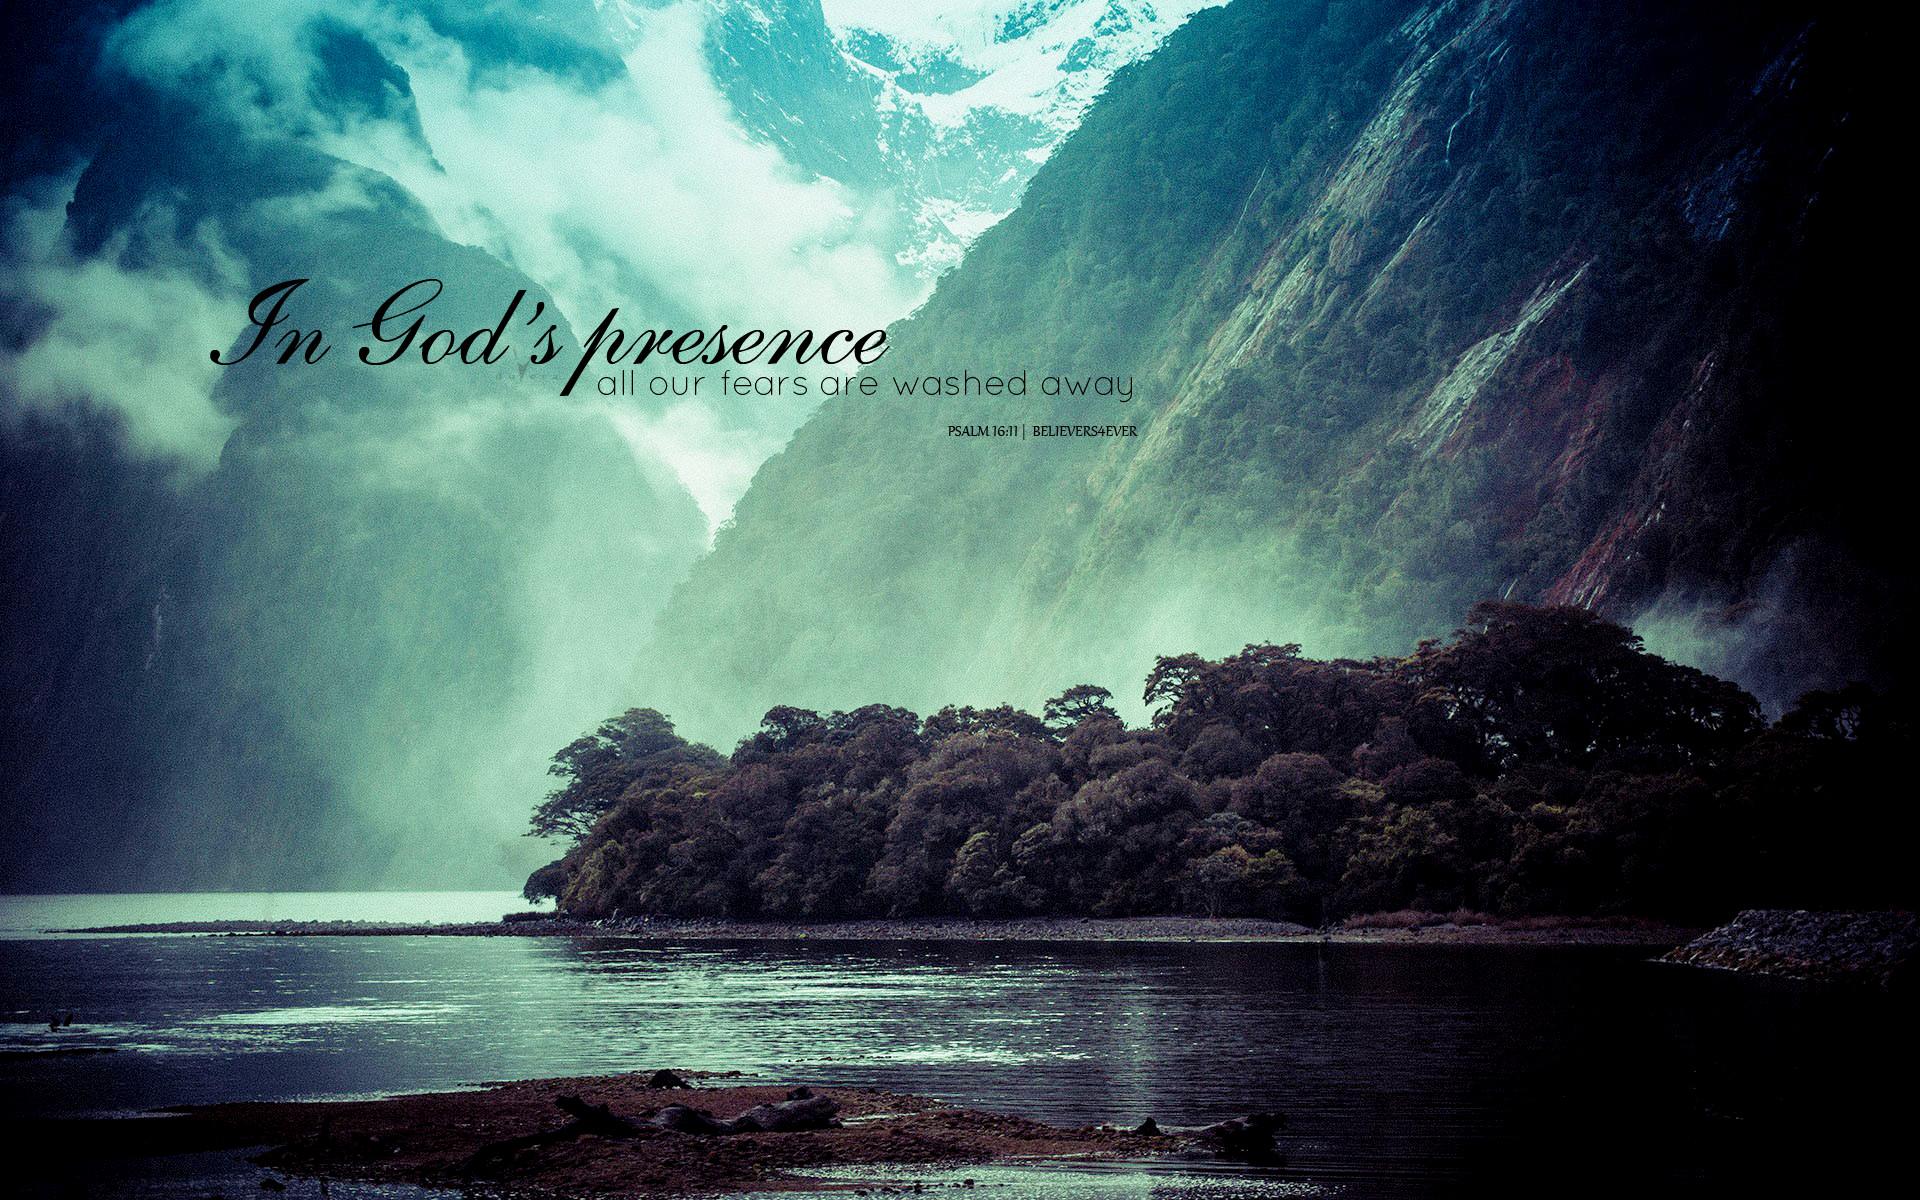 In God's presence, Psalm 16:11 Christian graphics, Christian wallpapers,  Christian desktop